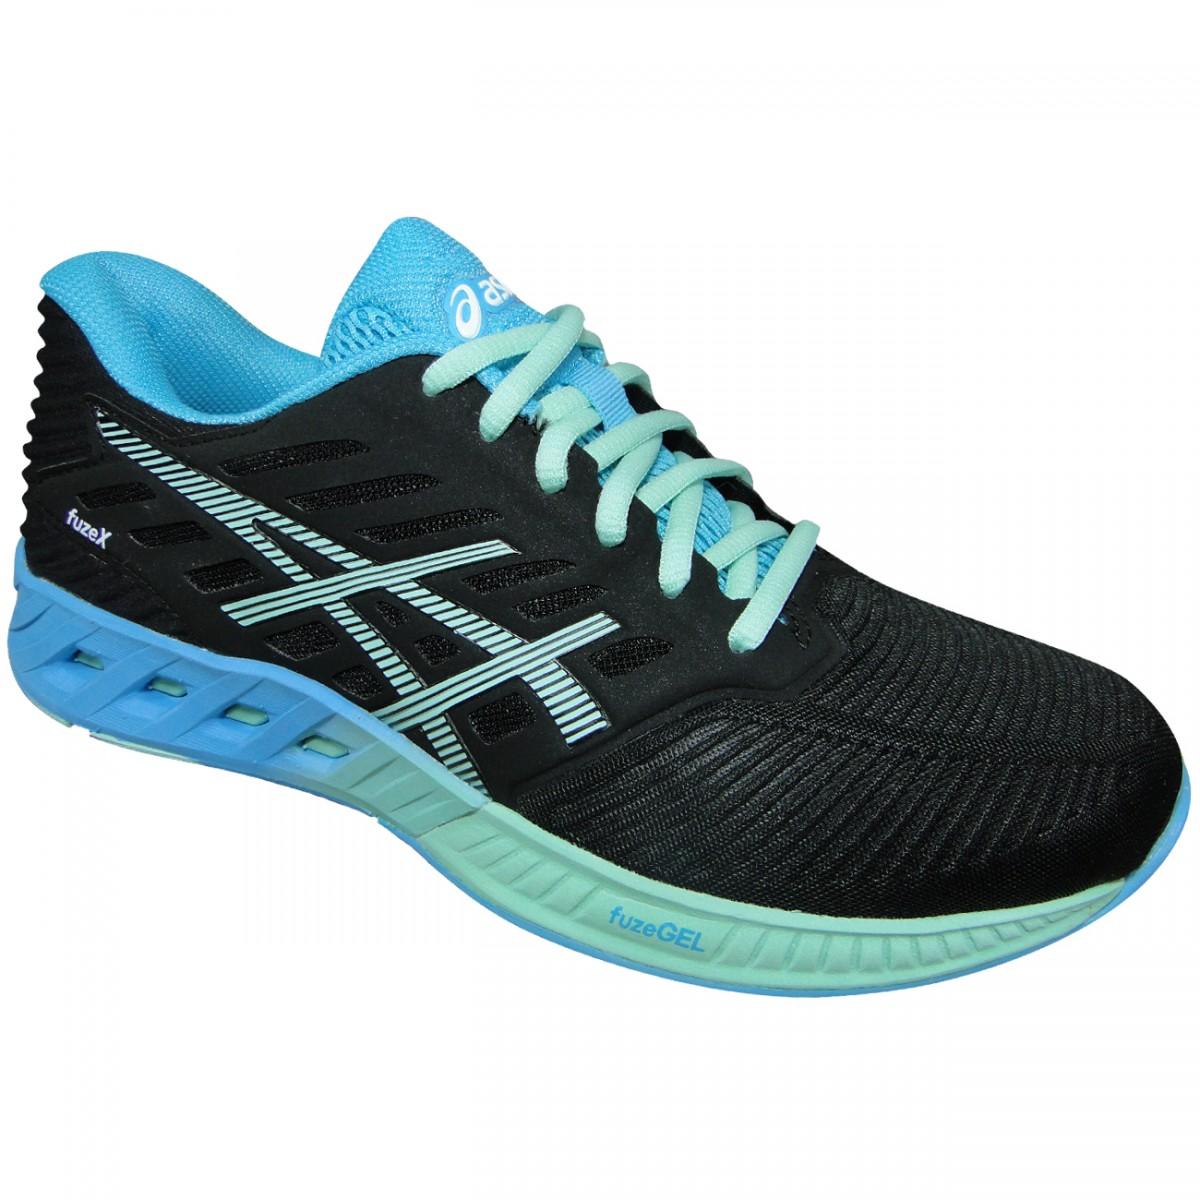 4db29b043ec Tenis Asics FuzeX T689N 9067 - Preto Verde Azul - Chuteira Nike ...